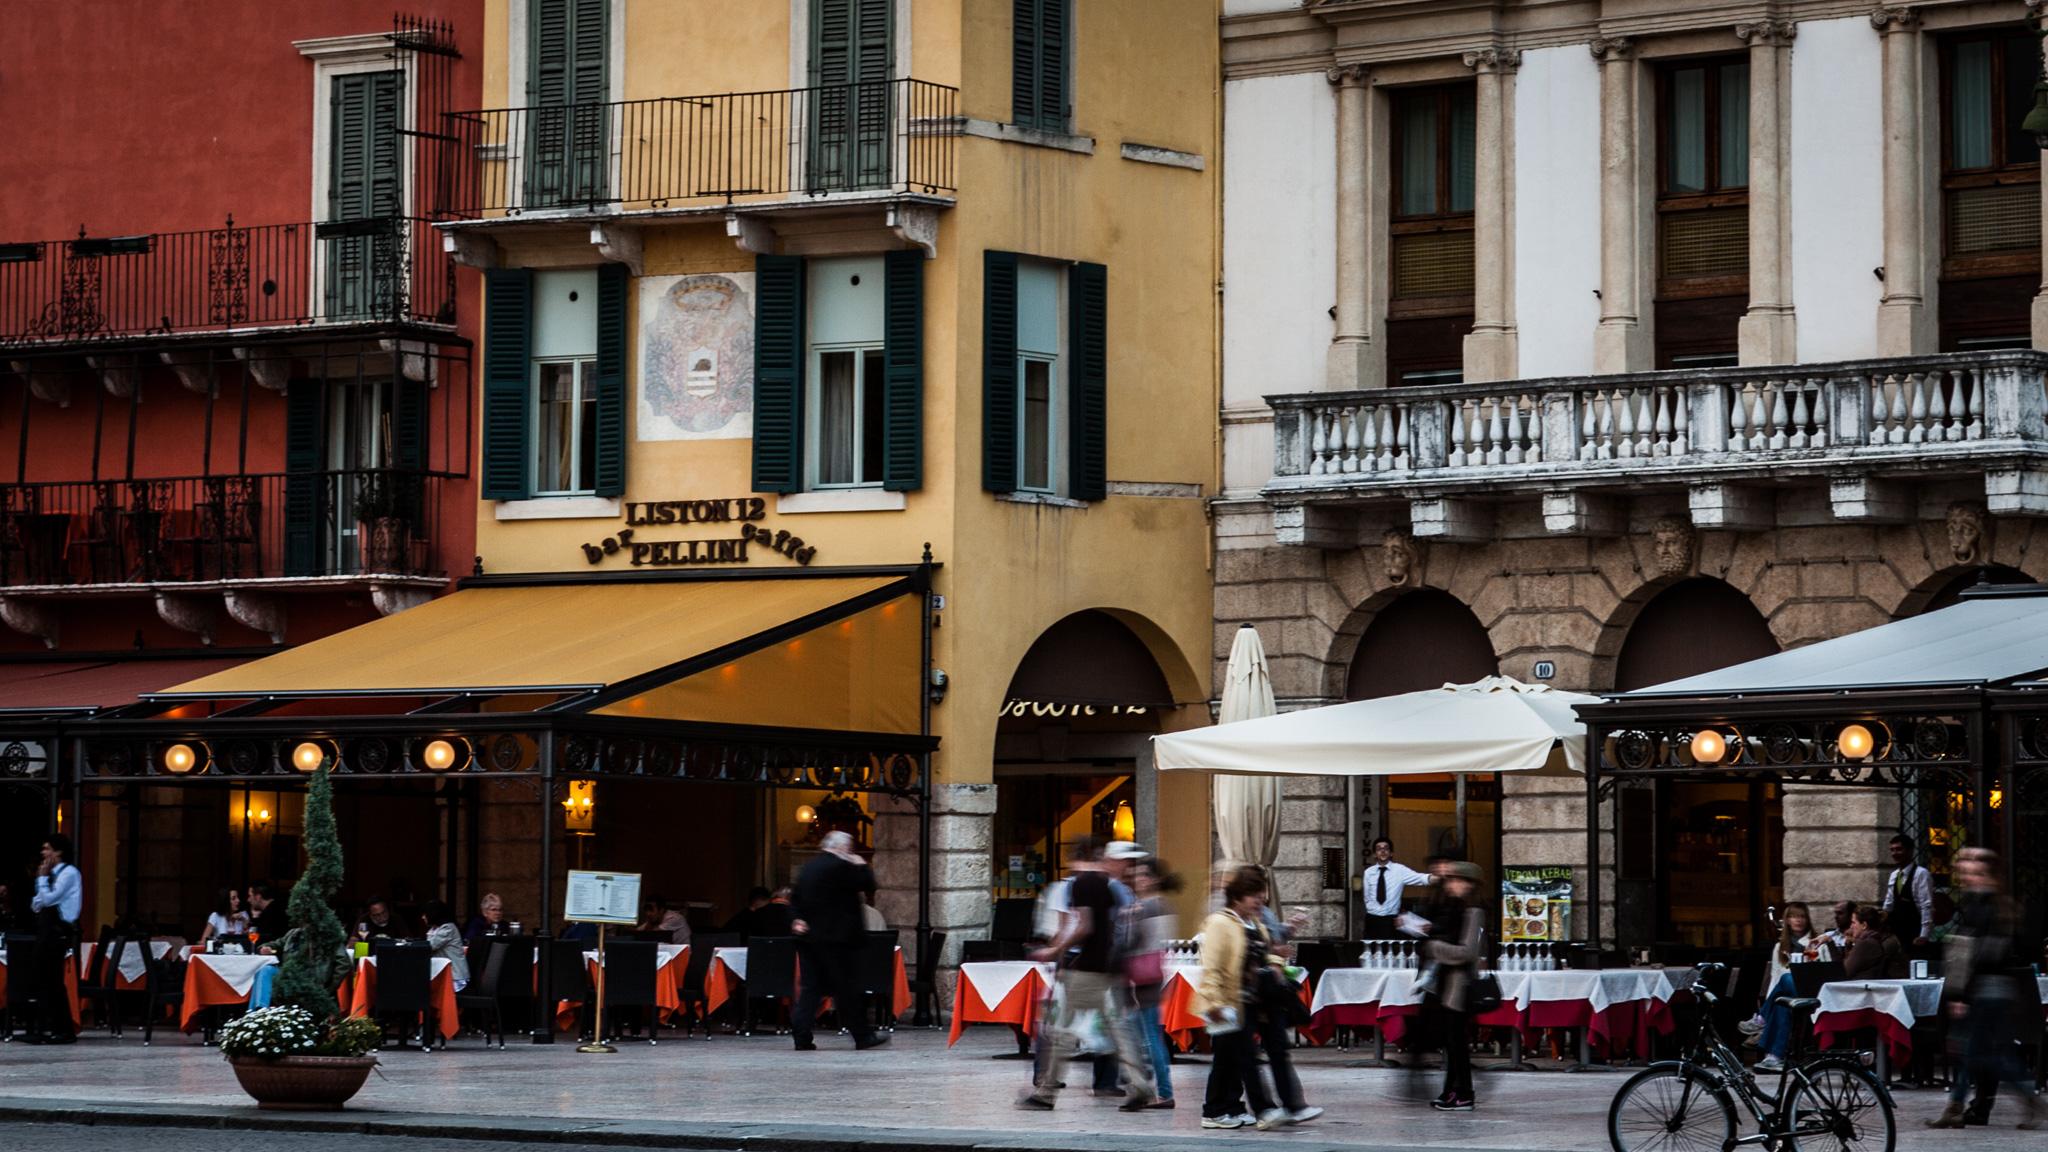 Italy : Verona : Piazza Bra